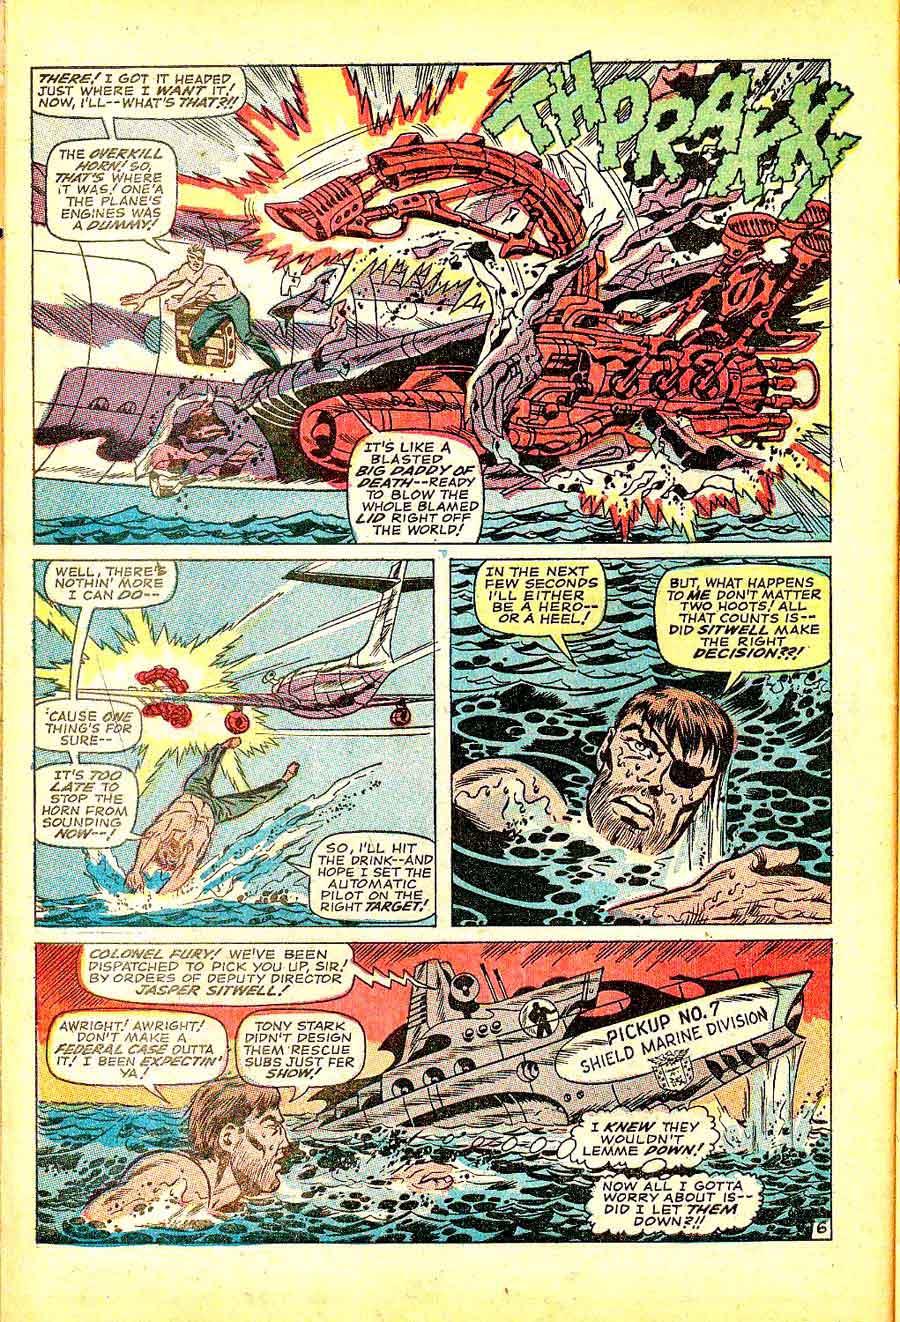 Strange Tales v1 #152 nick fury shield comic book page art by Jim Steranko